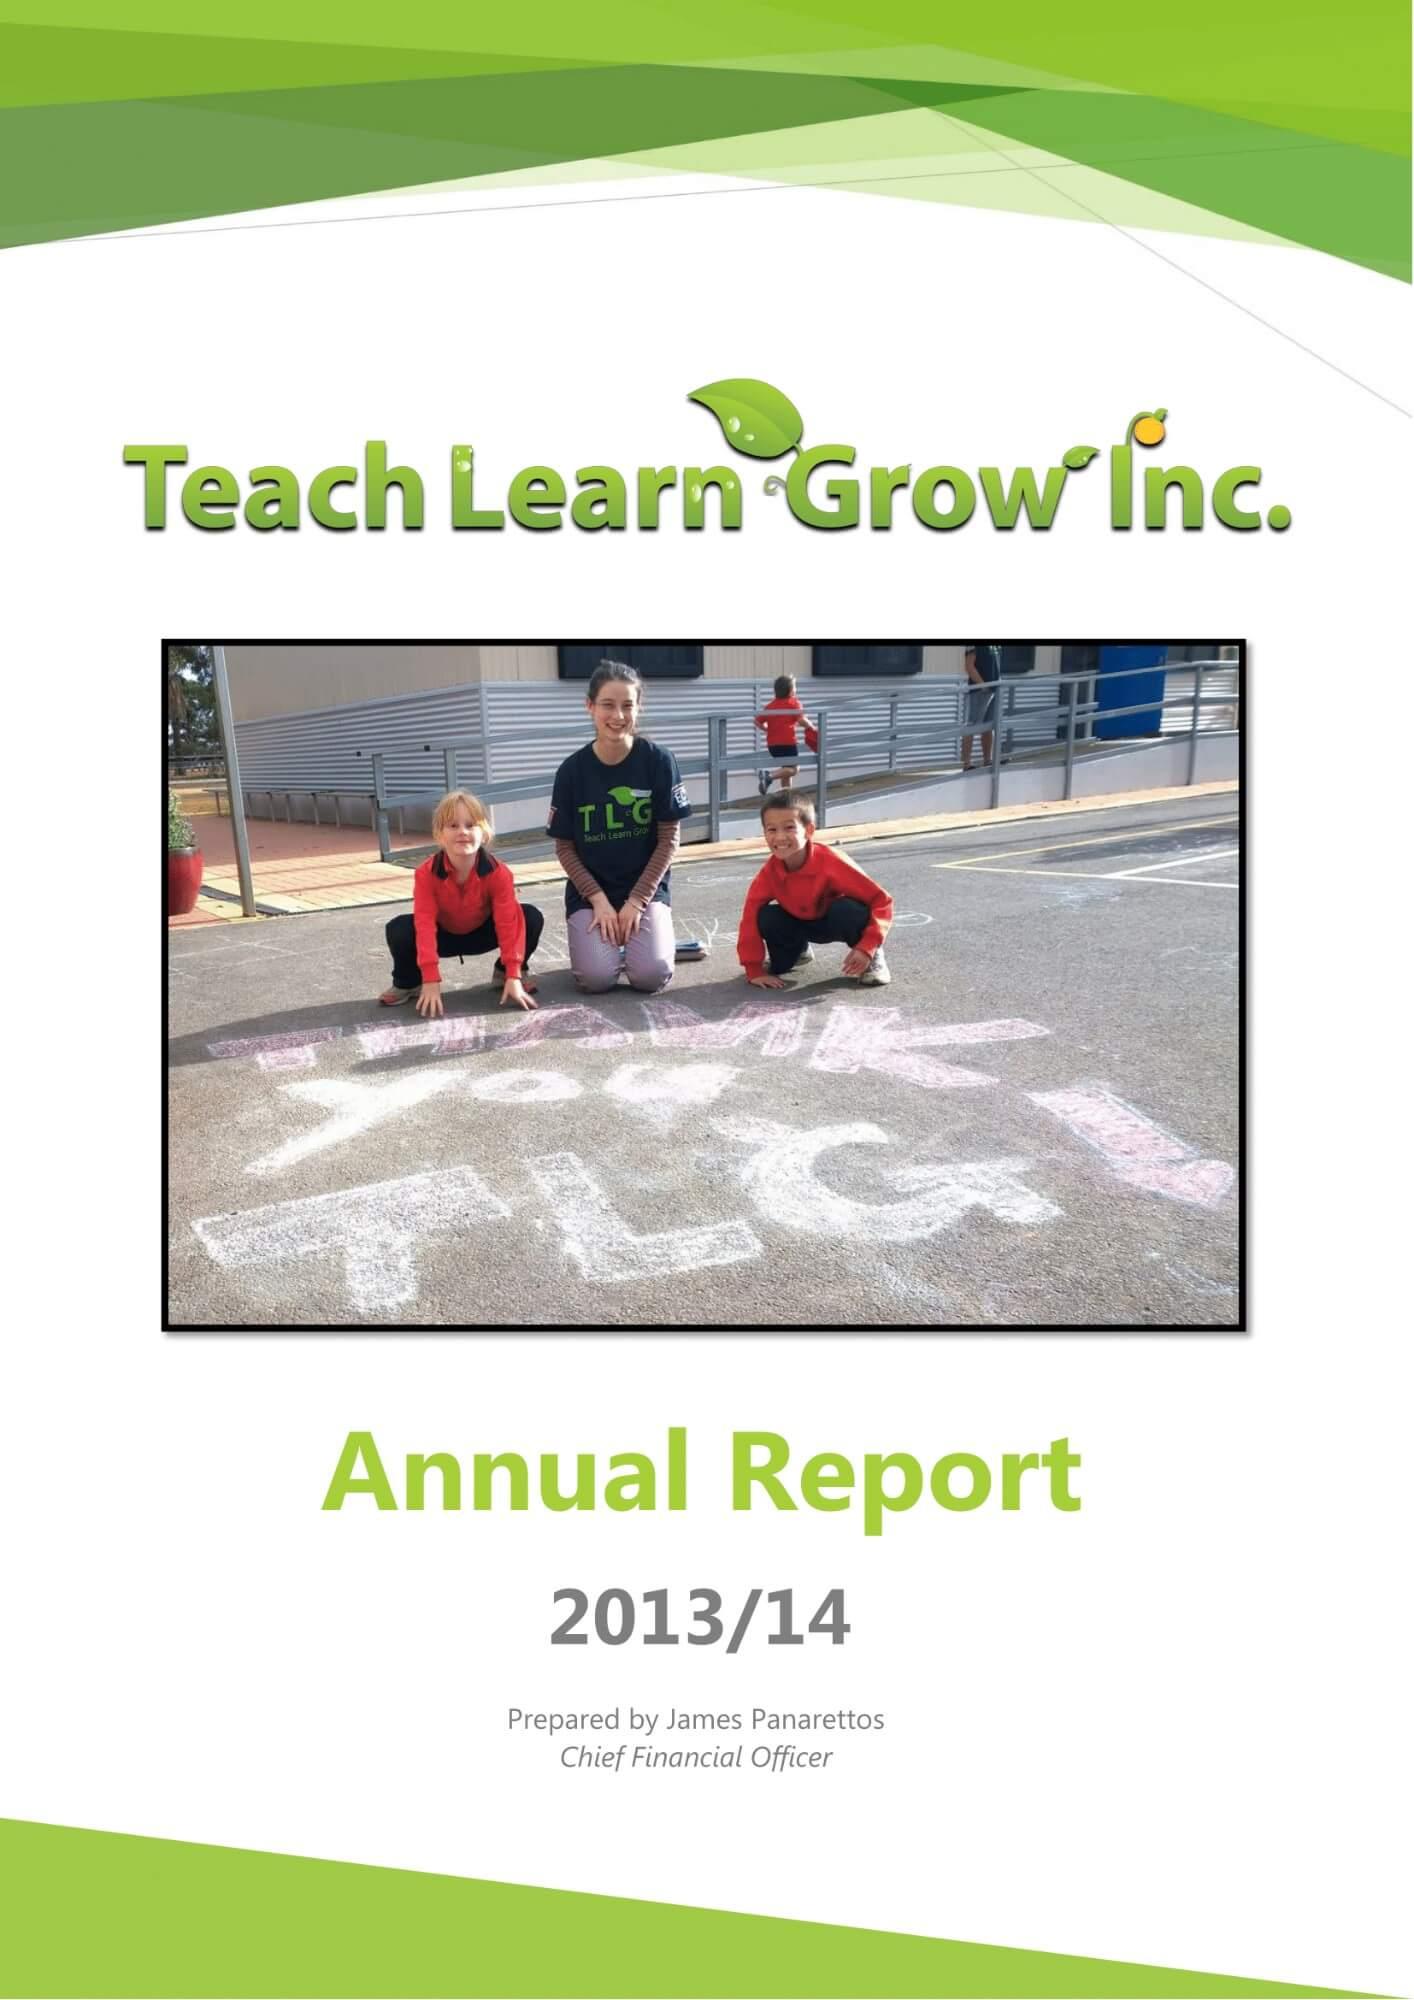 tlg-annual-report-FY13-01.jpg